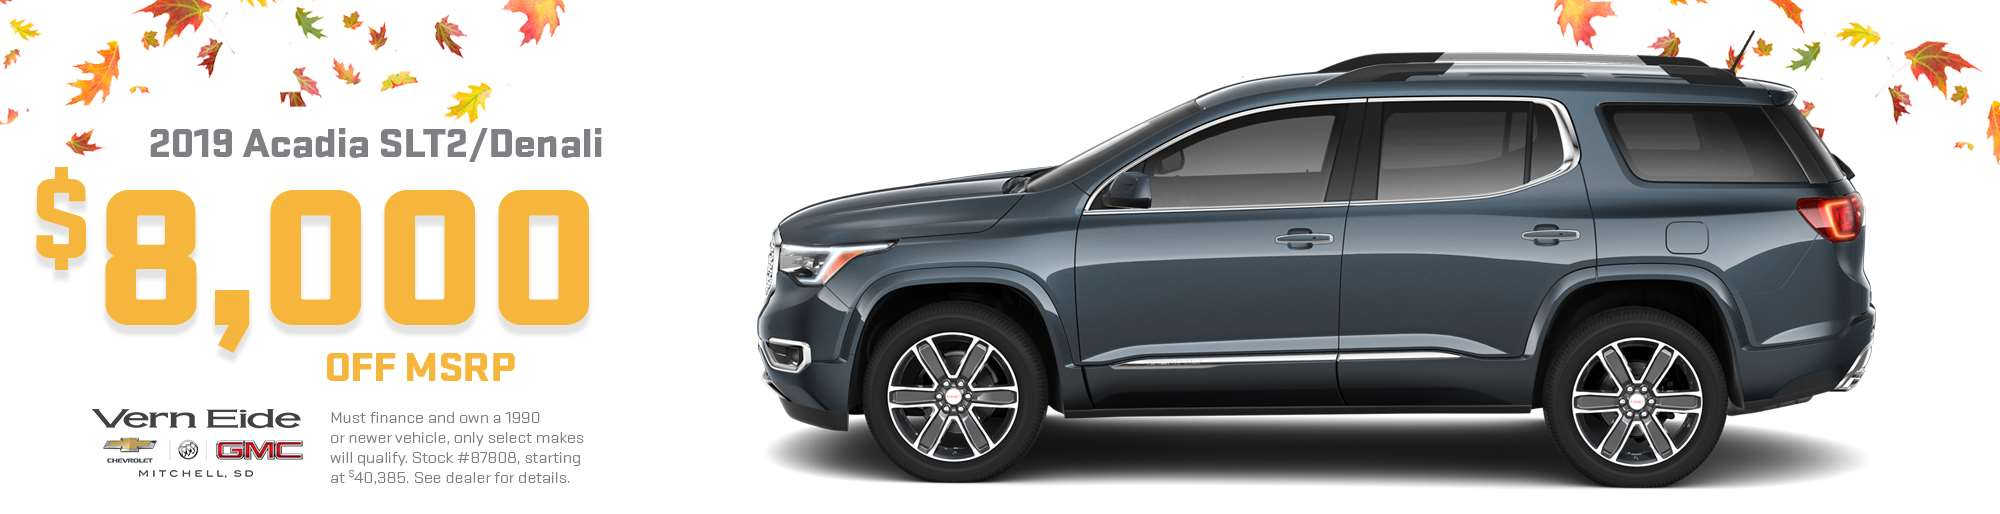 Vern Eide GM | Mitchell, SD | New & Used GM Cars & Trucks!